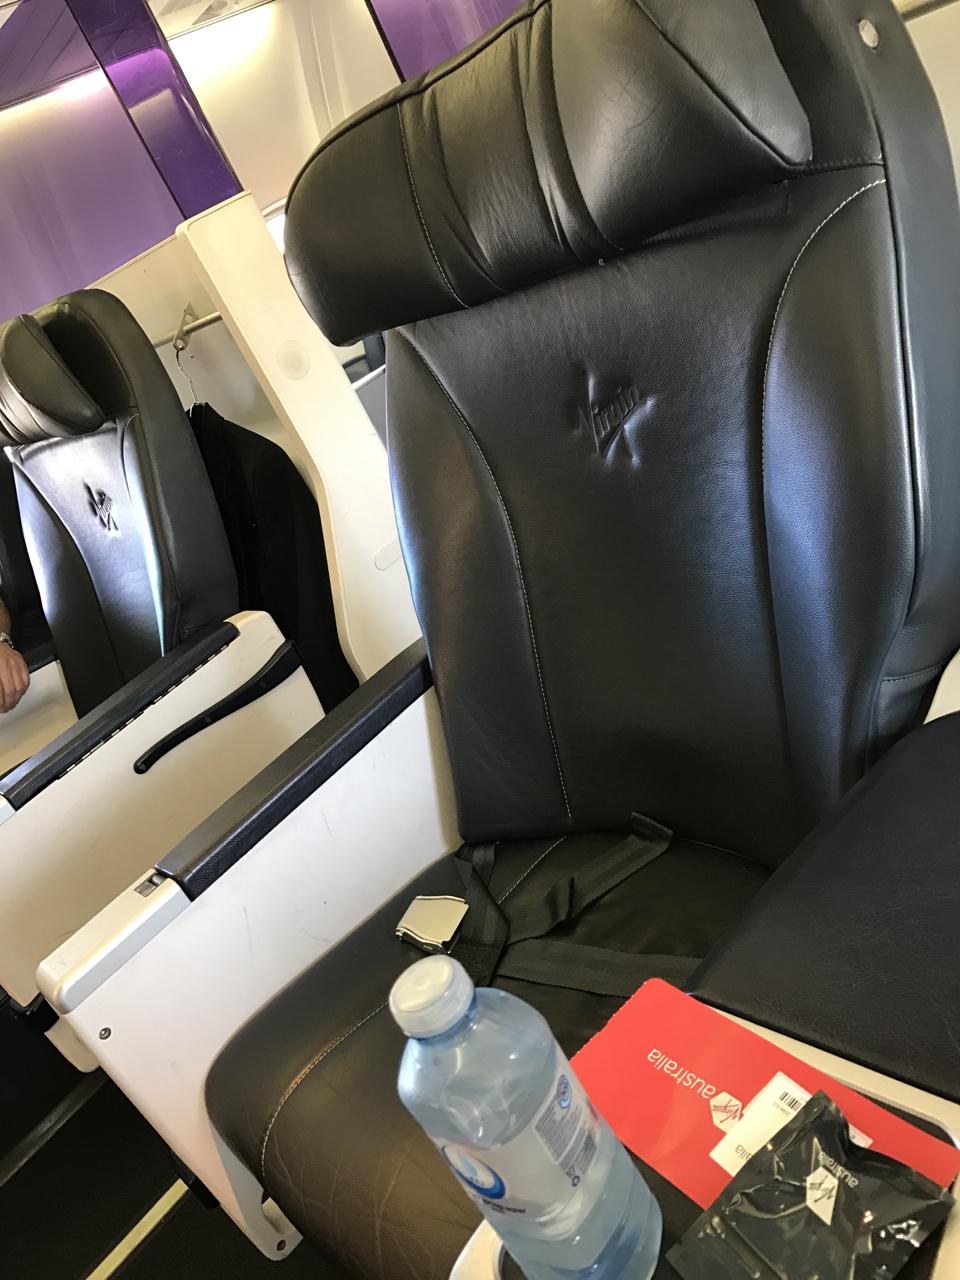 Virgin Australia Business Class Ool Syd B737 800 Palo